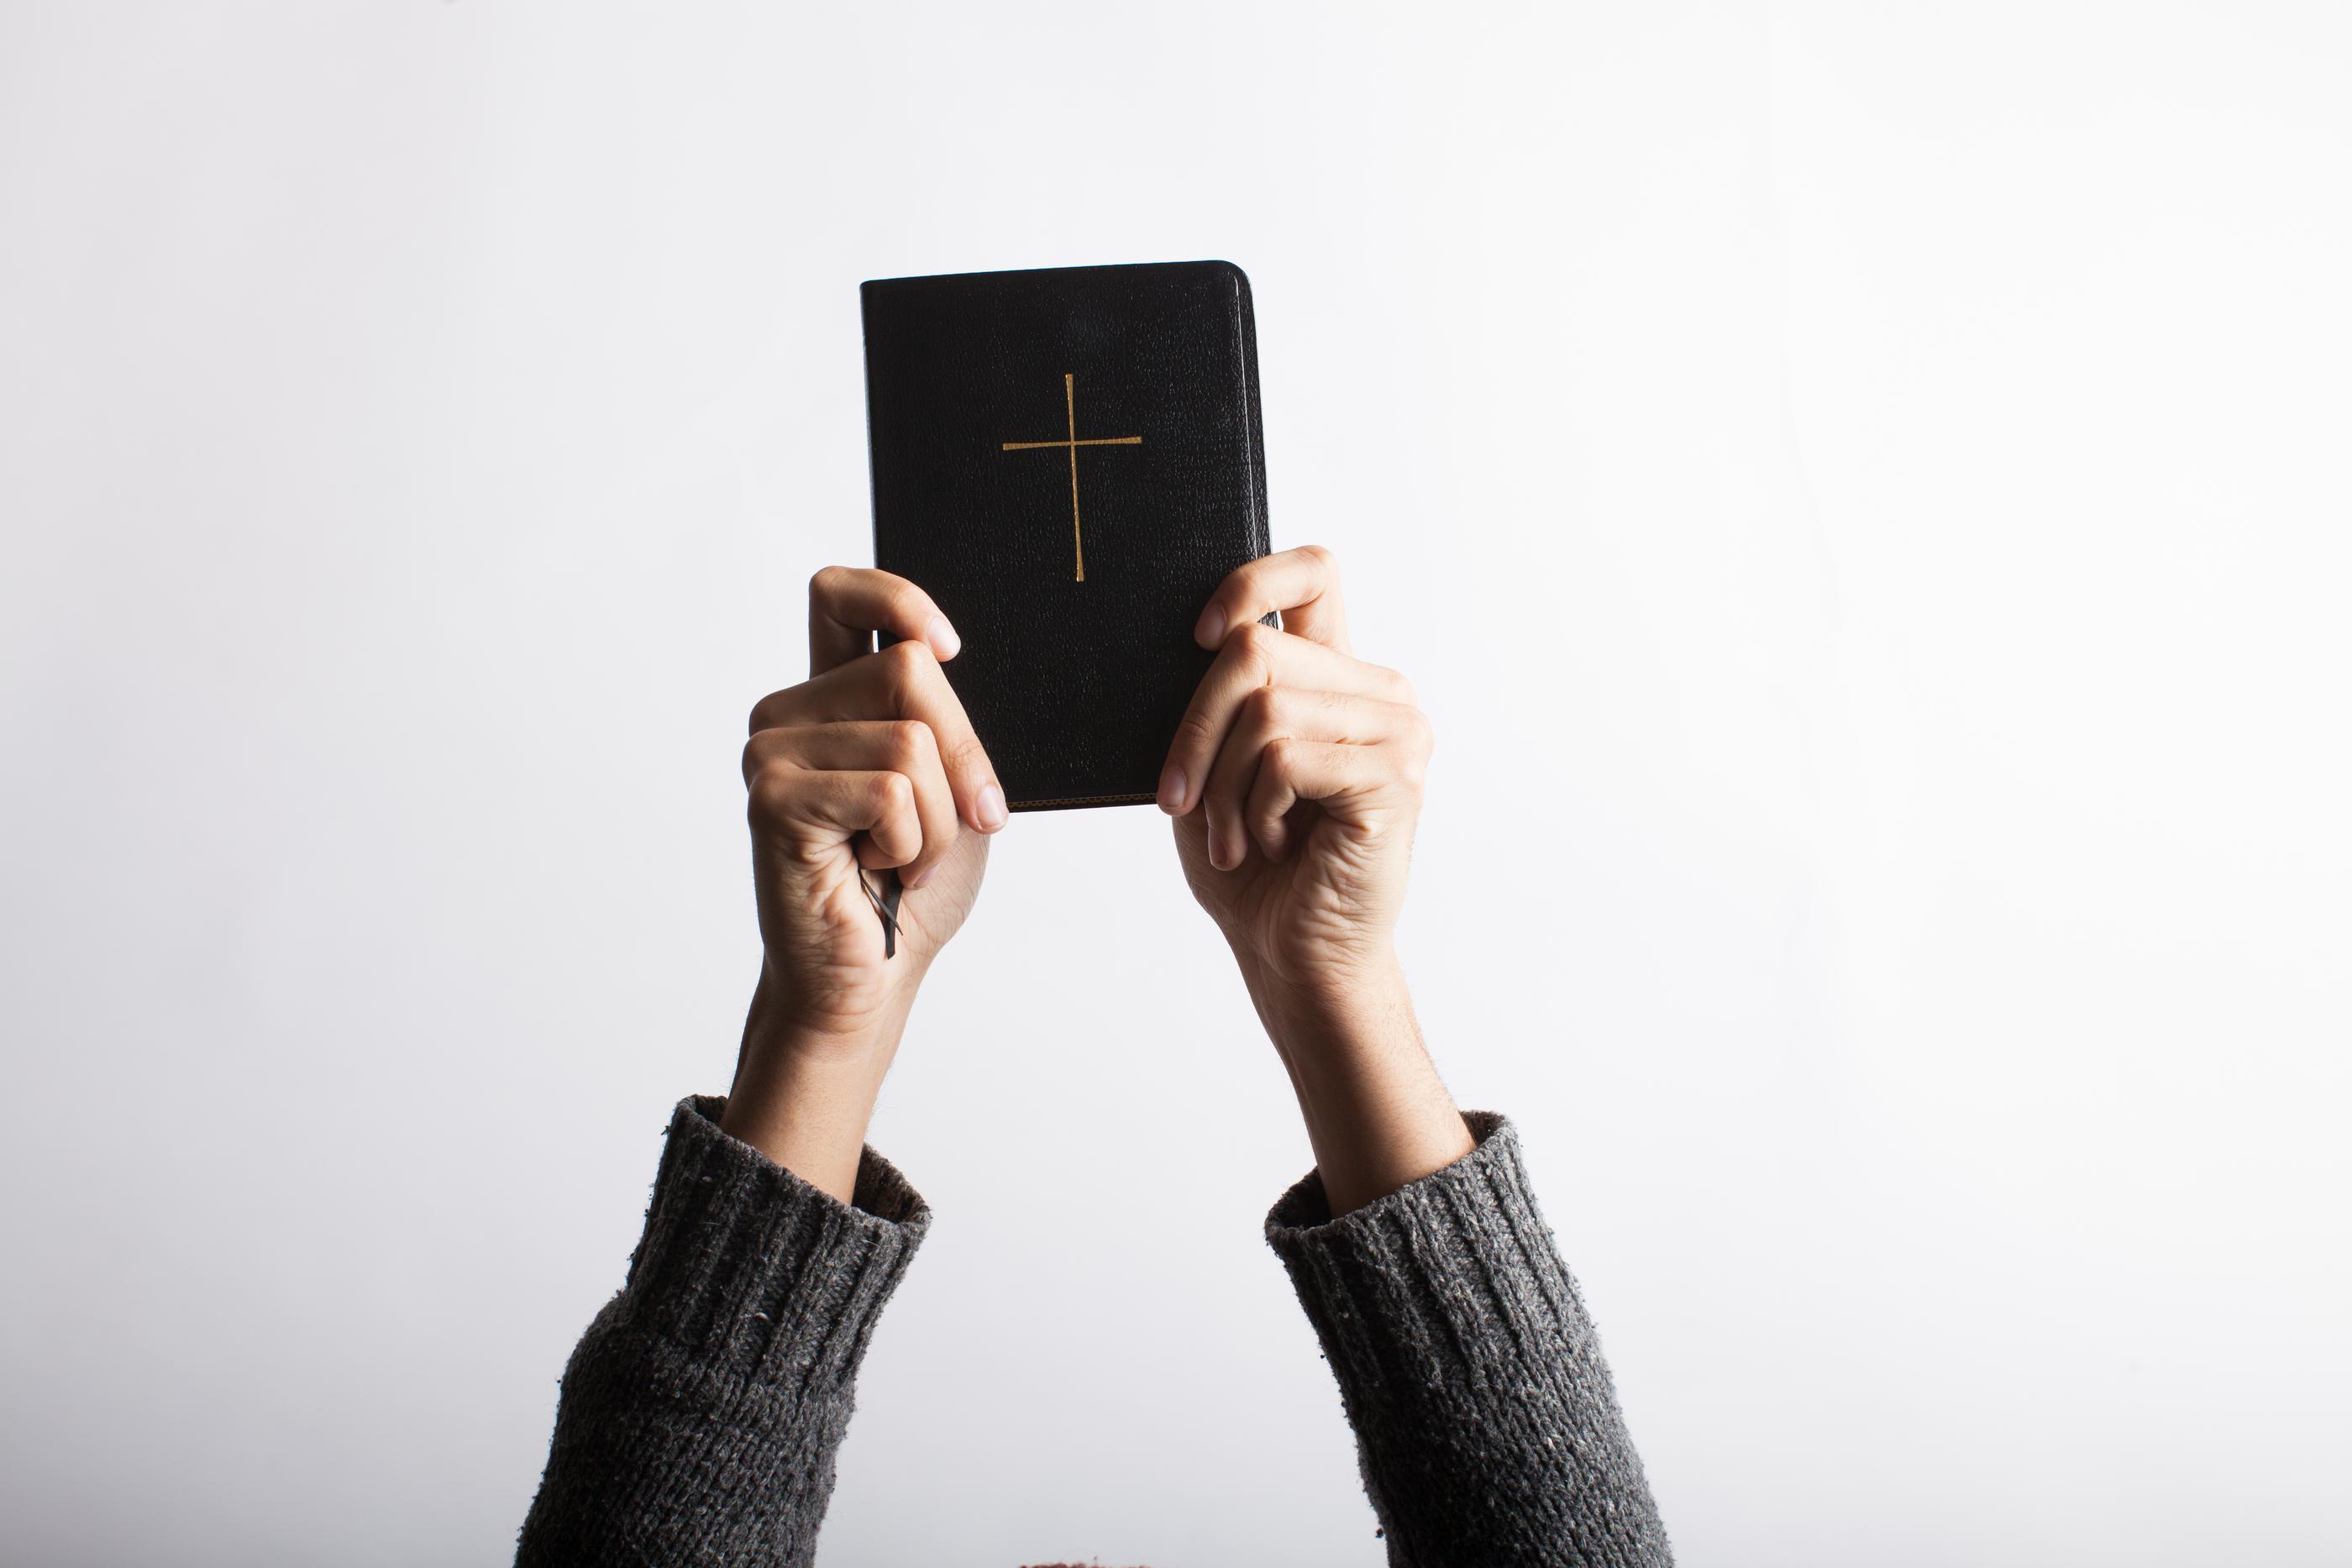 evangelho biblia